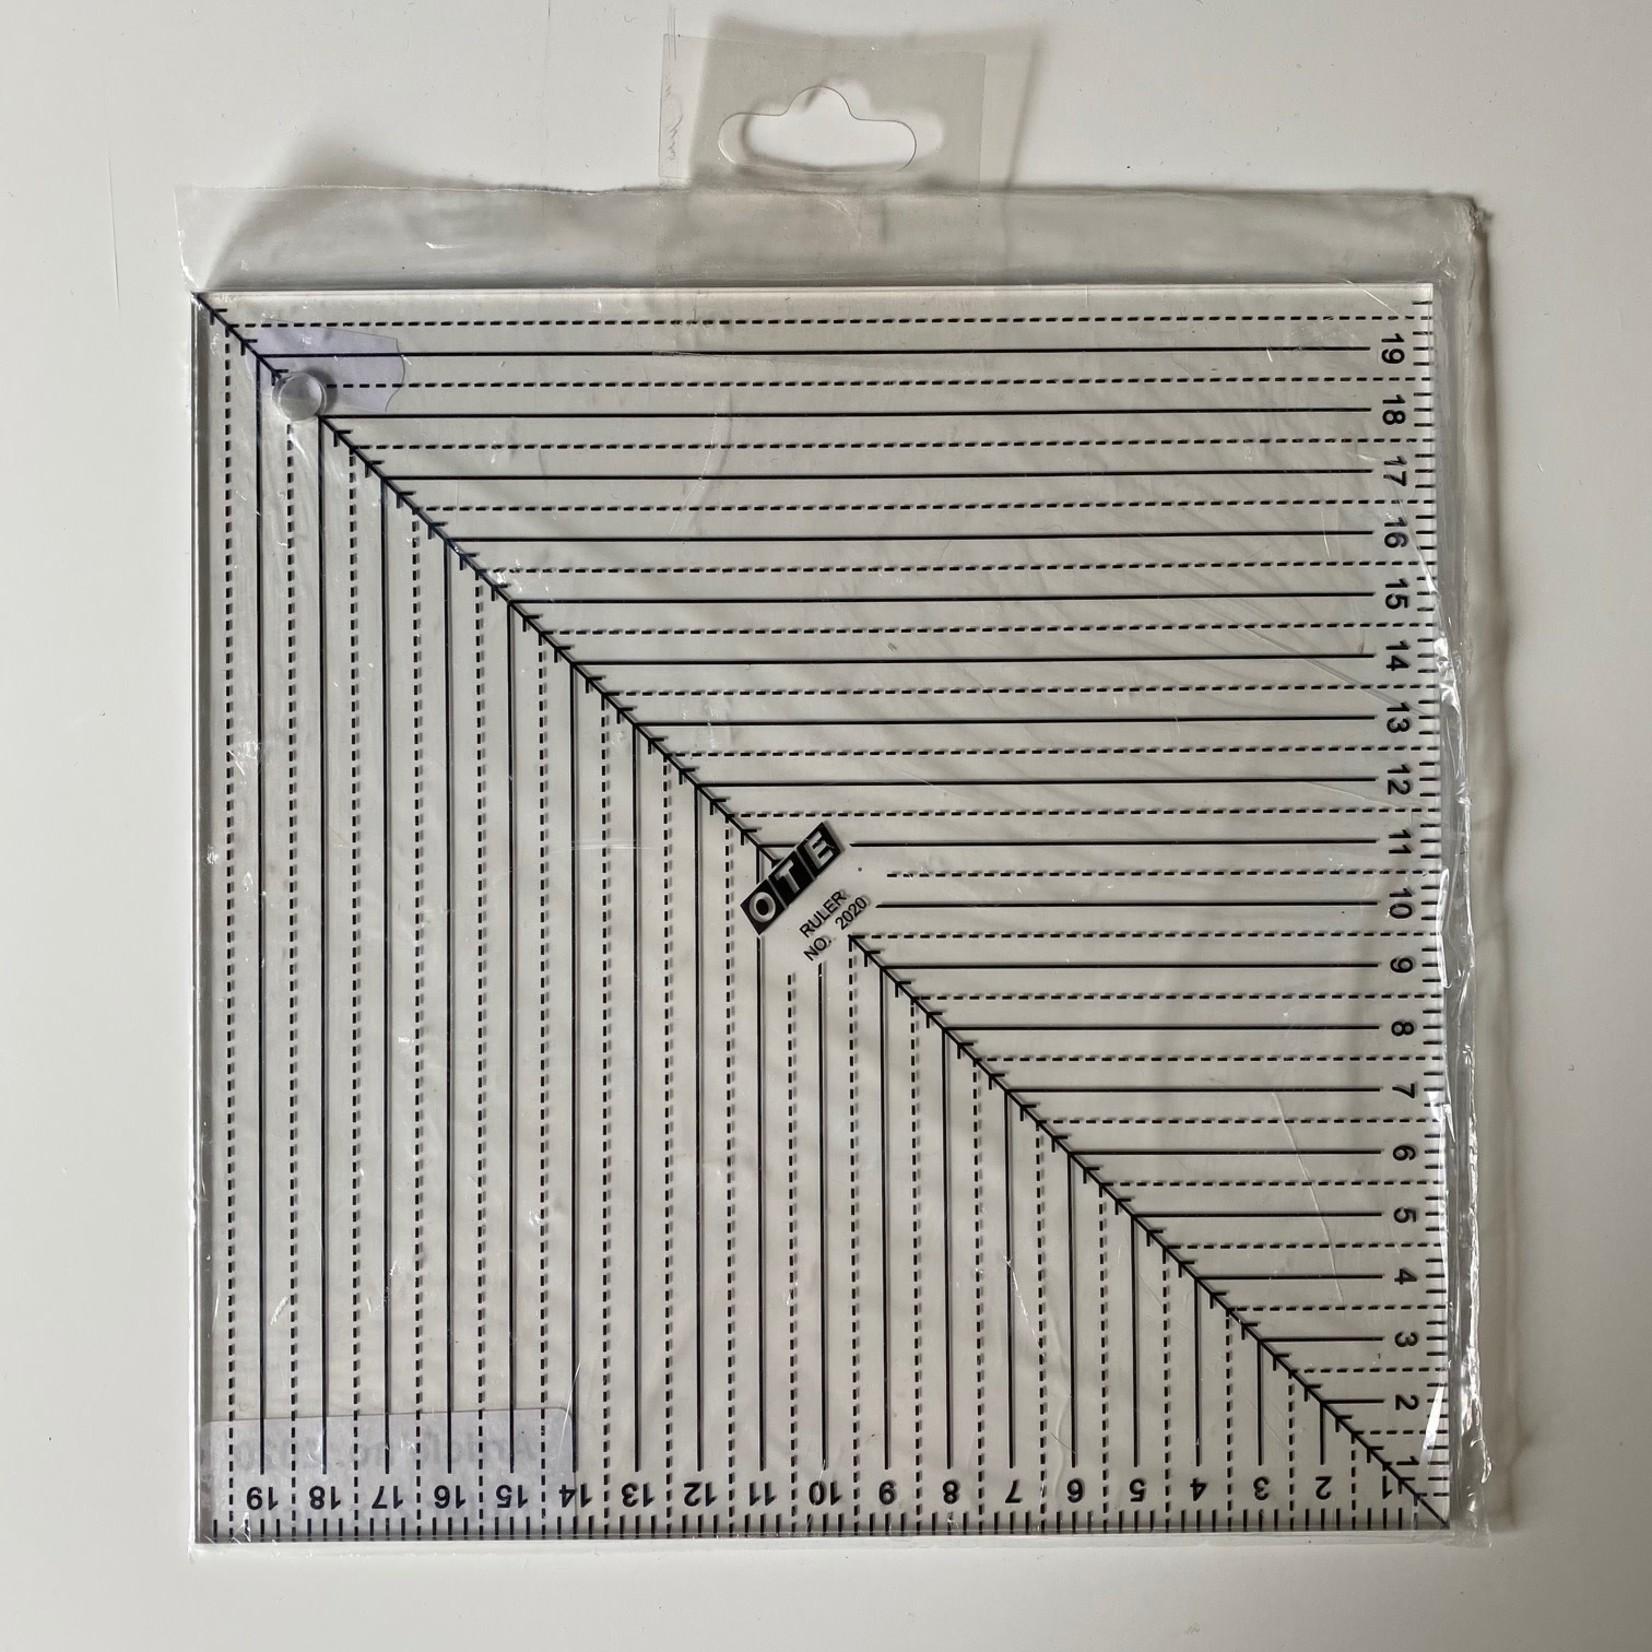 OTE Liniaal - OTE - 20 cm x 20 cm